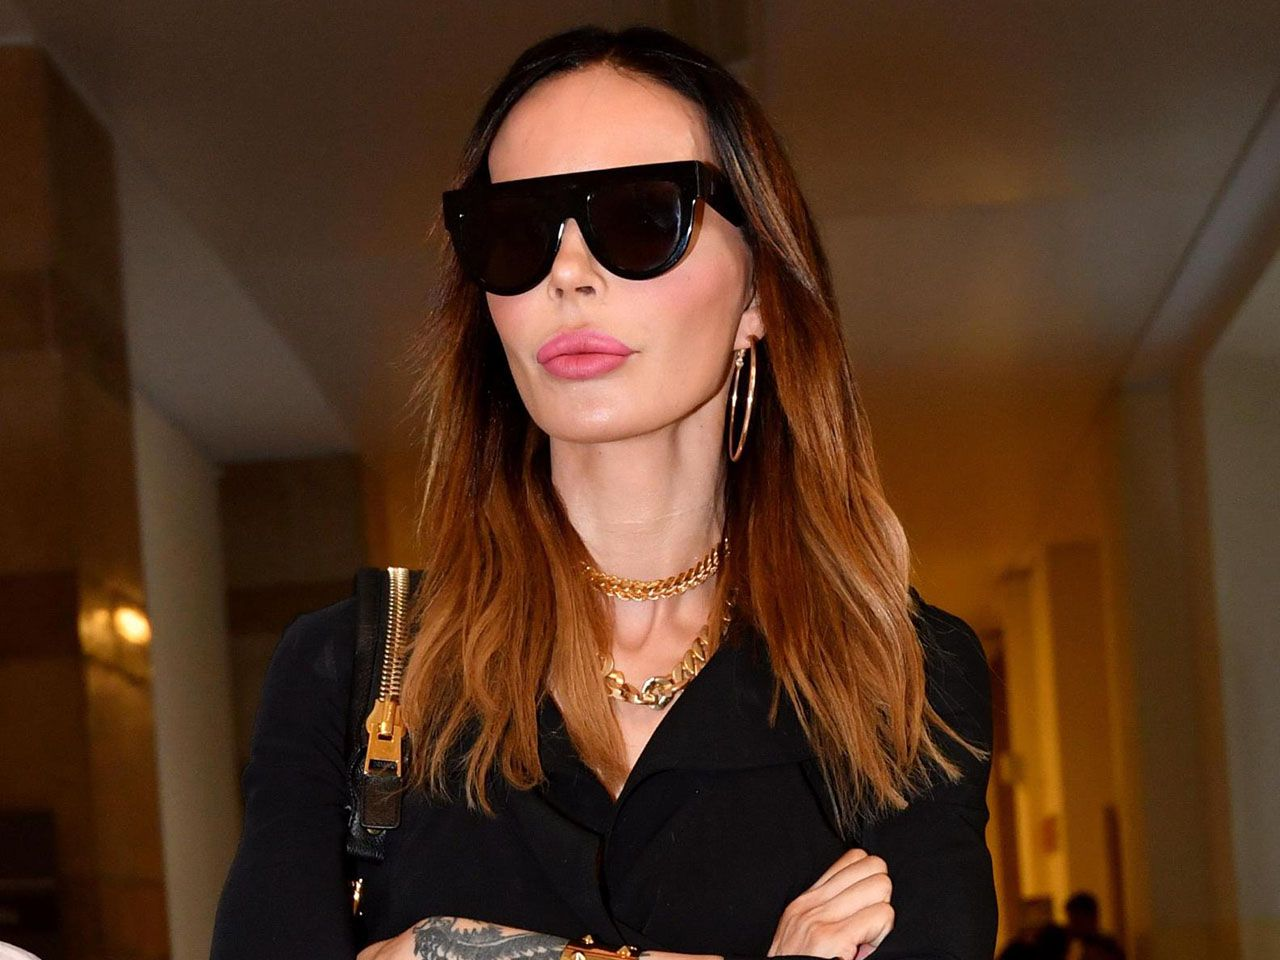 Nina Moric condannata a risarcire Belén per averla definita 'un viado'